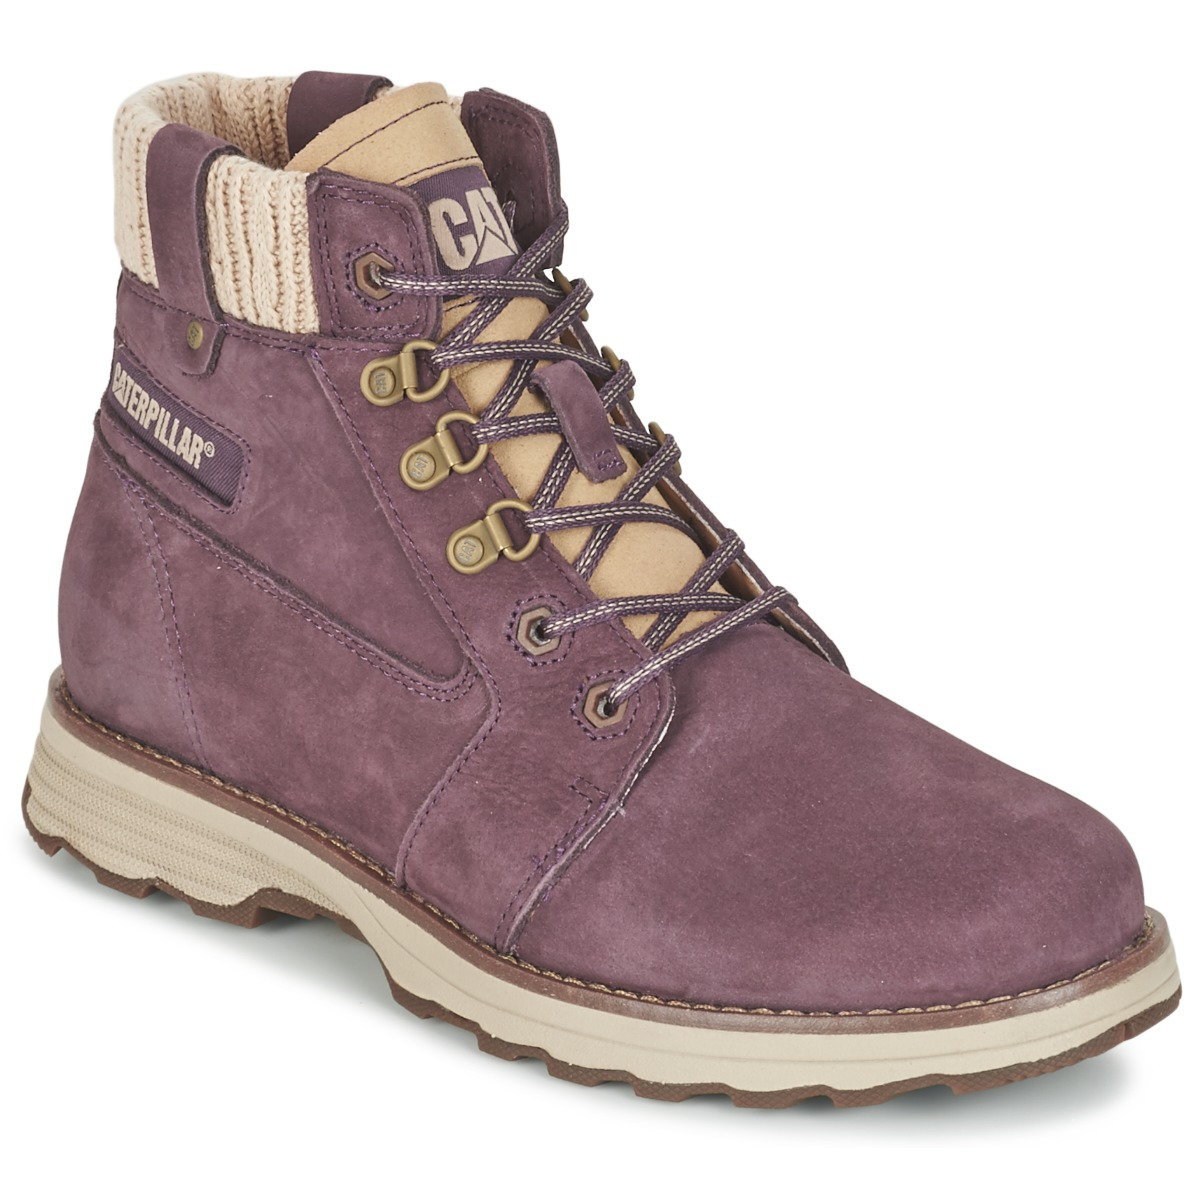 Caterpillar charli violet chaussure pas cher avec shoes - Chaussure caterpillar homme pas cher ...